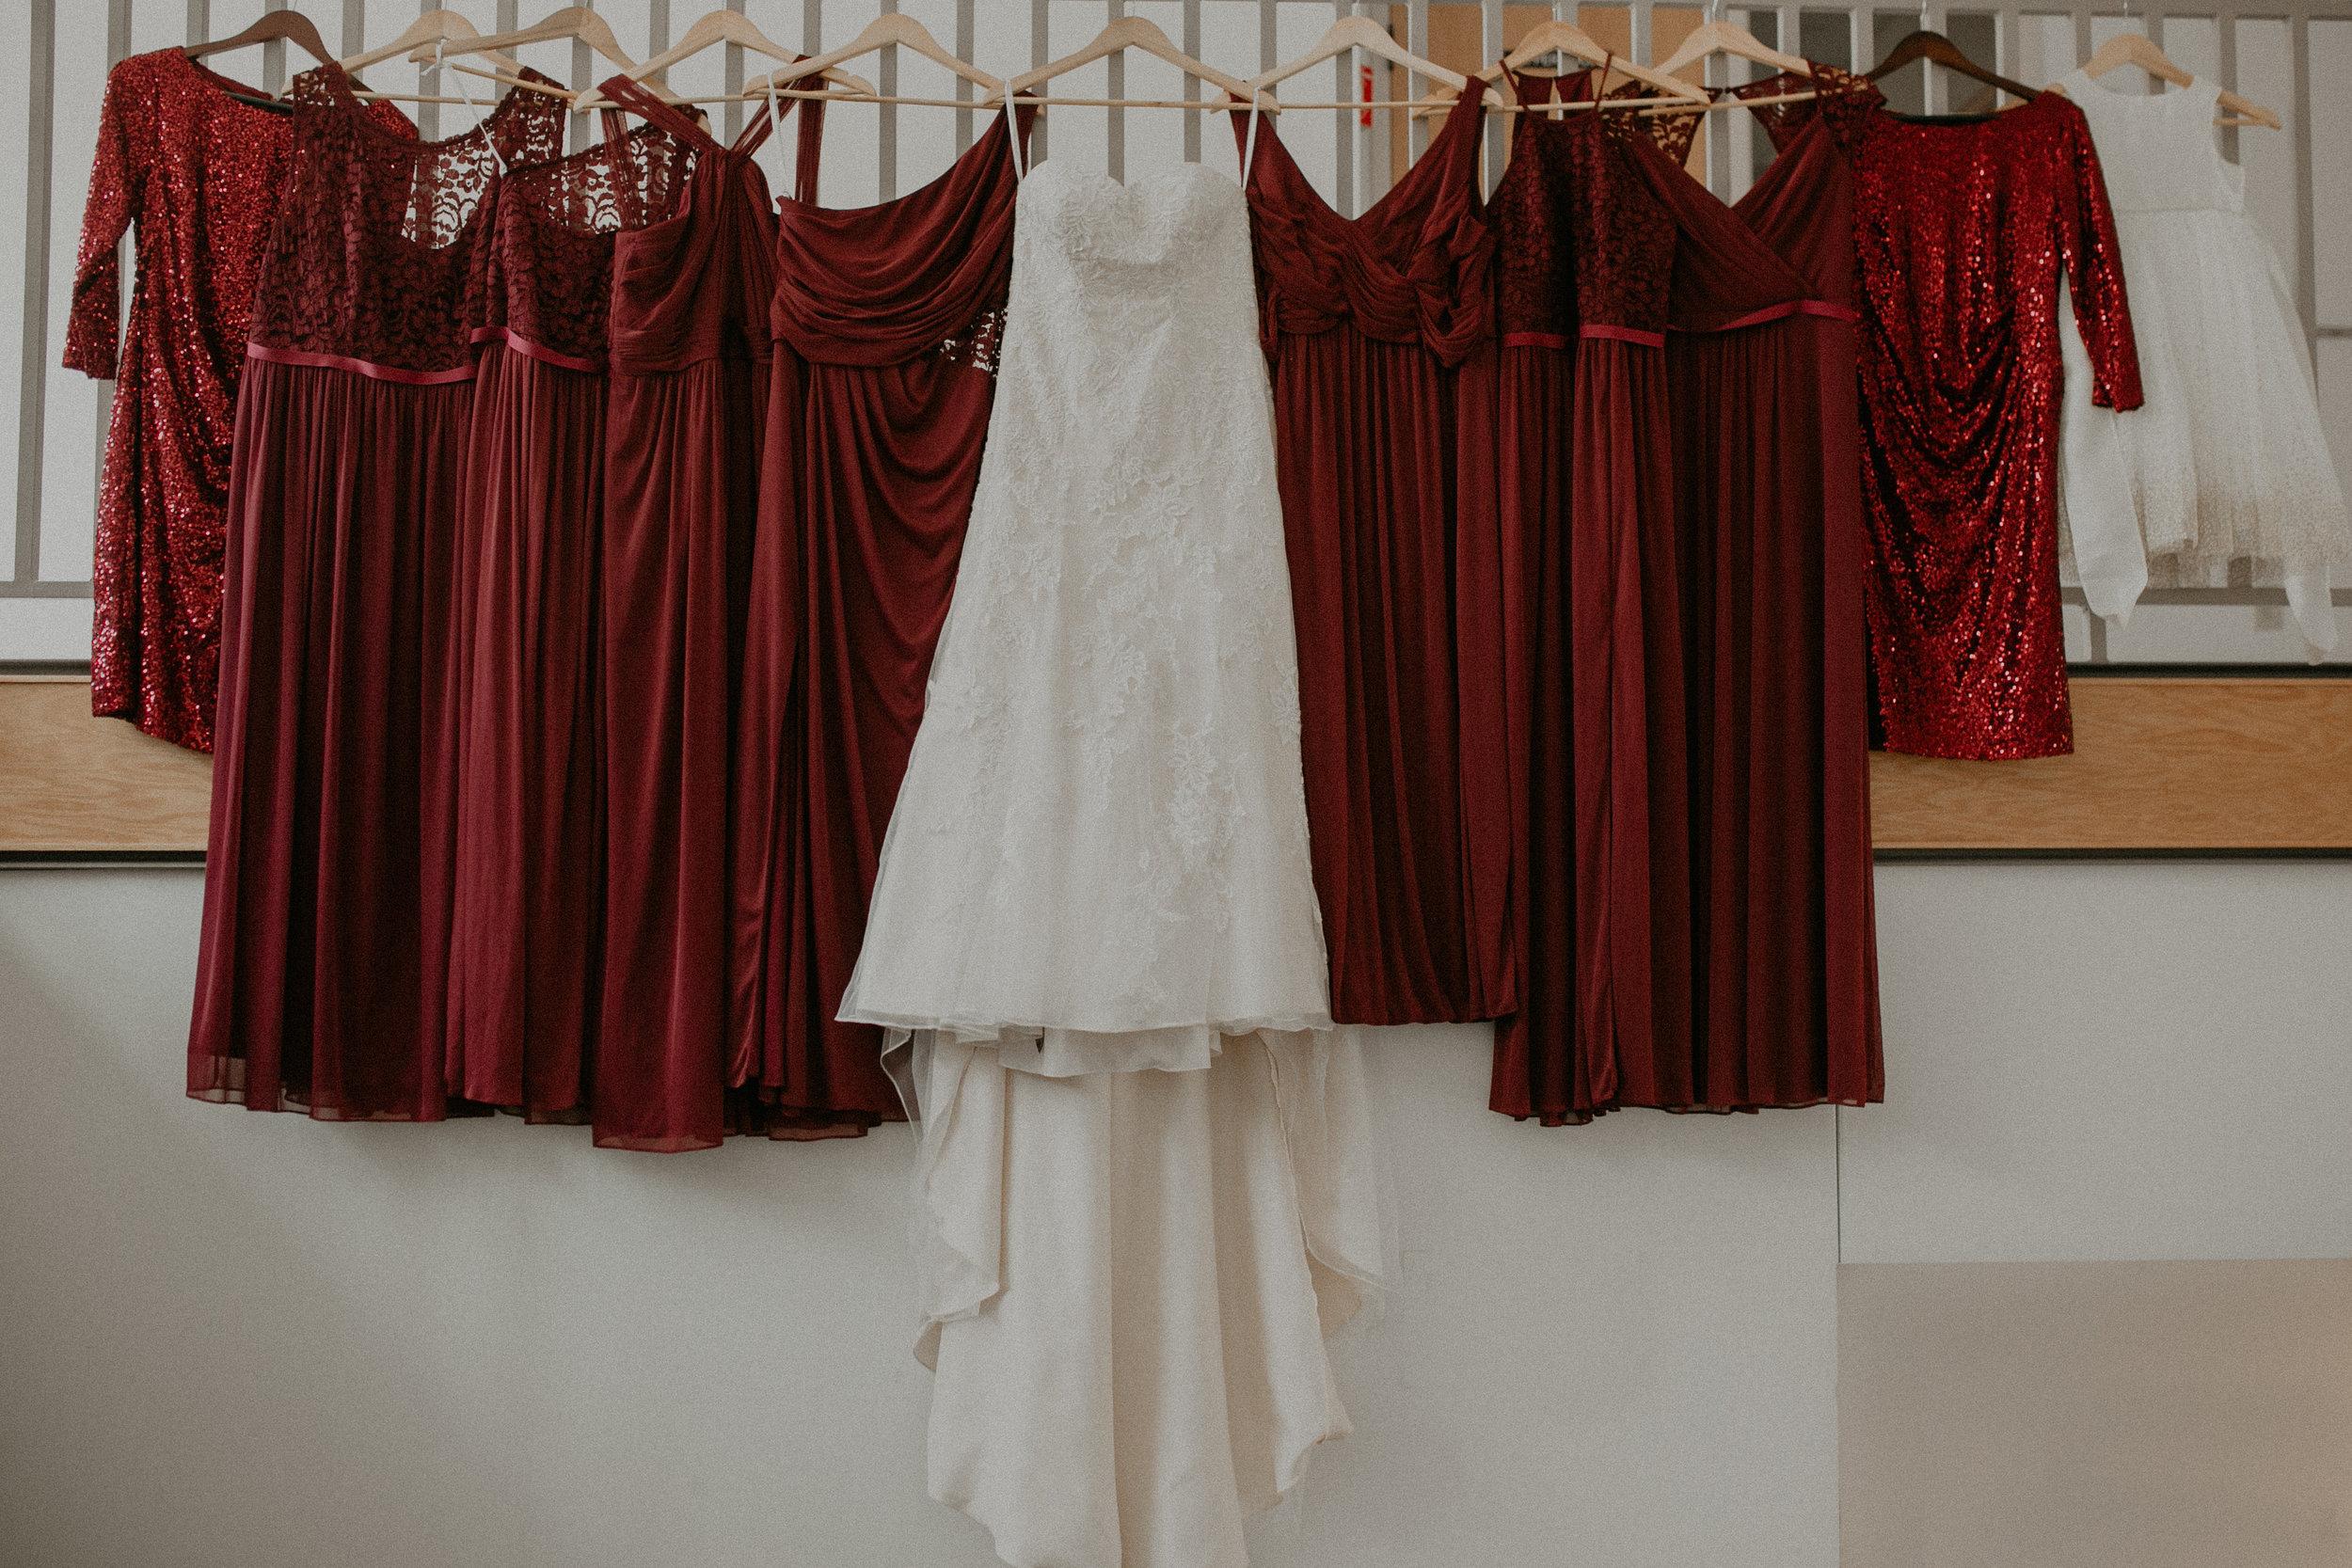 st-bridgets-catholic-church-river-falls-wedding-photographer